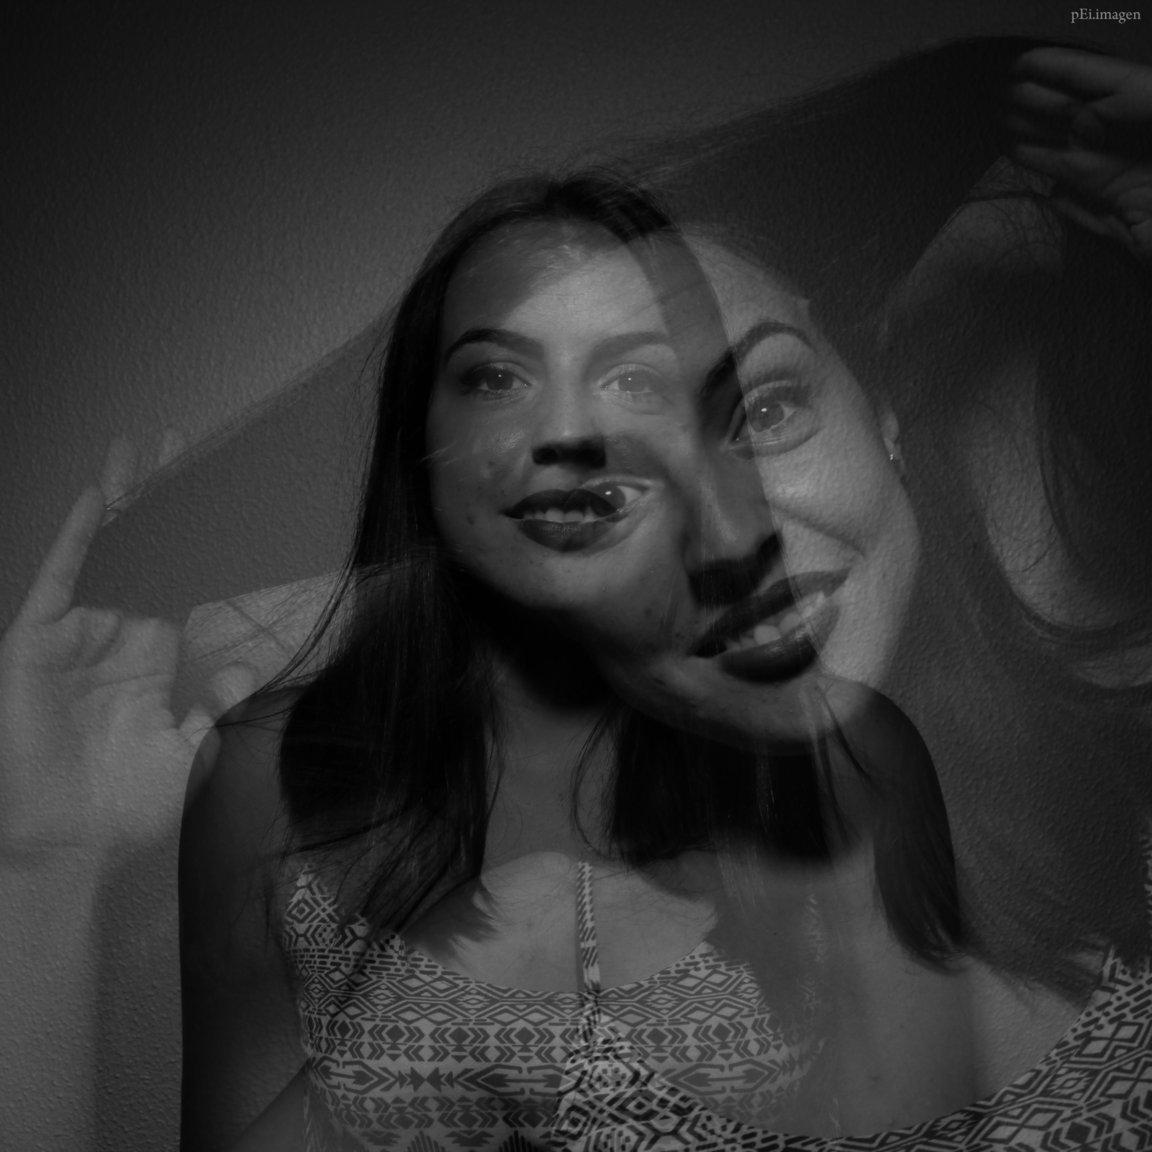 peipegata me myself I proyectos fotografia peipegatafotografia # 113 Ana Marina Sanchez